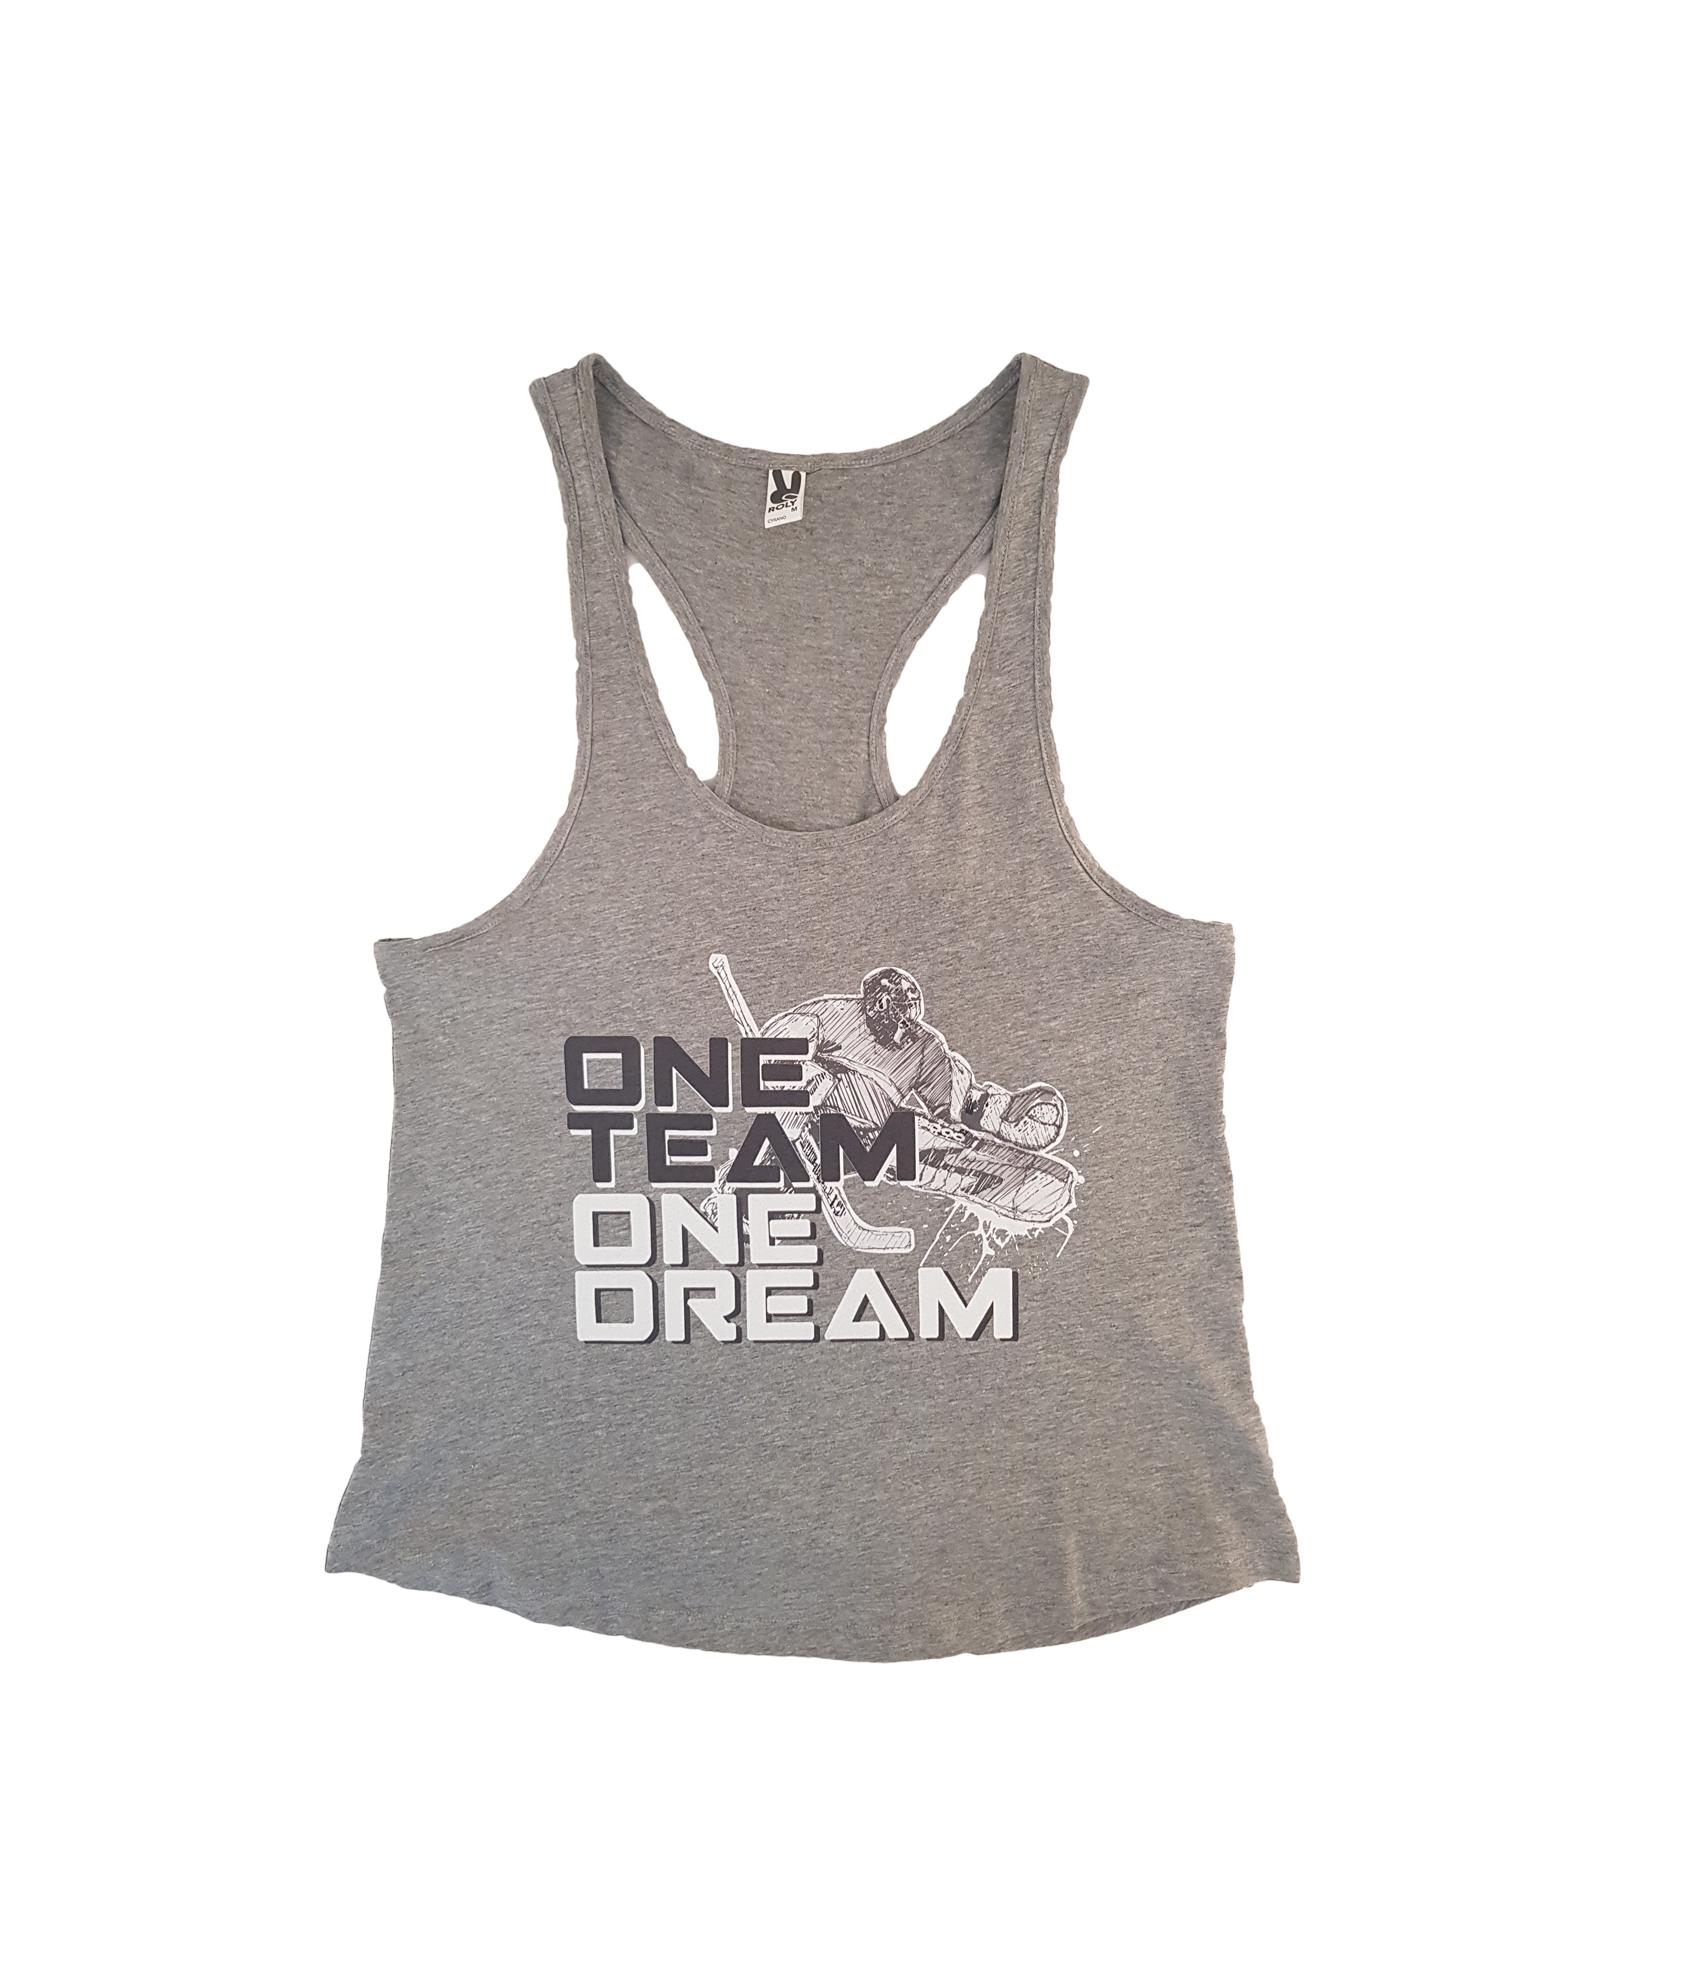 HOKEJAM.LV One Team One Dream Adult Tank Top